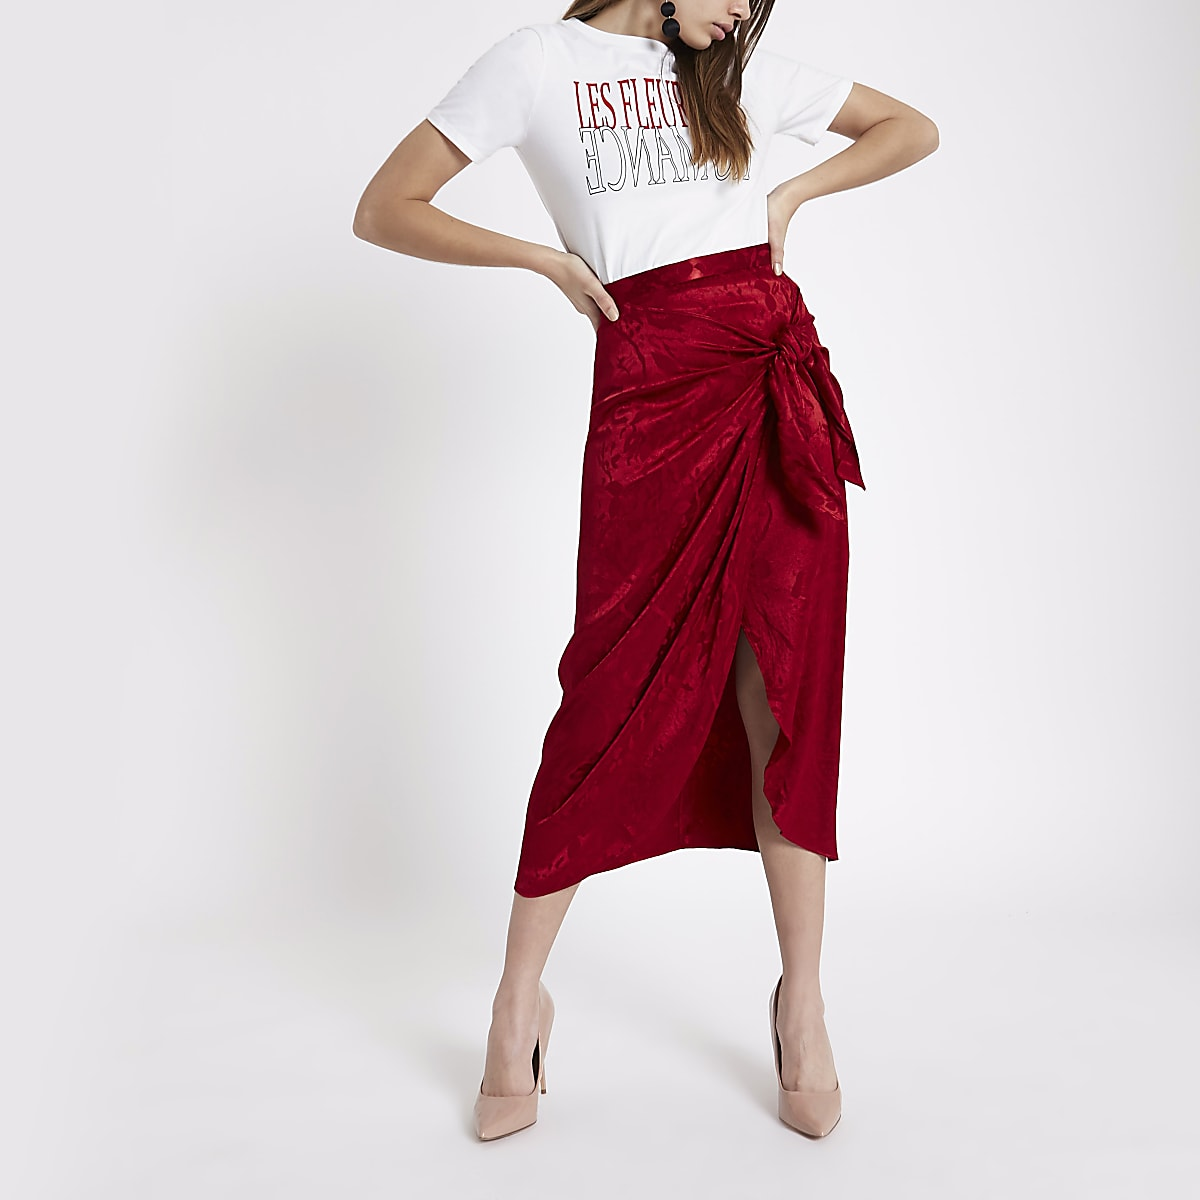 8cbcc41e55 Red satin jacquard tie front pencil skirt - Midi Skirts - Skirts - women